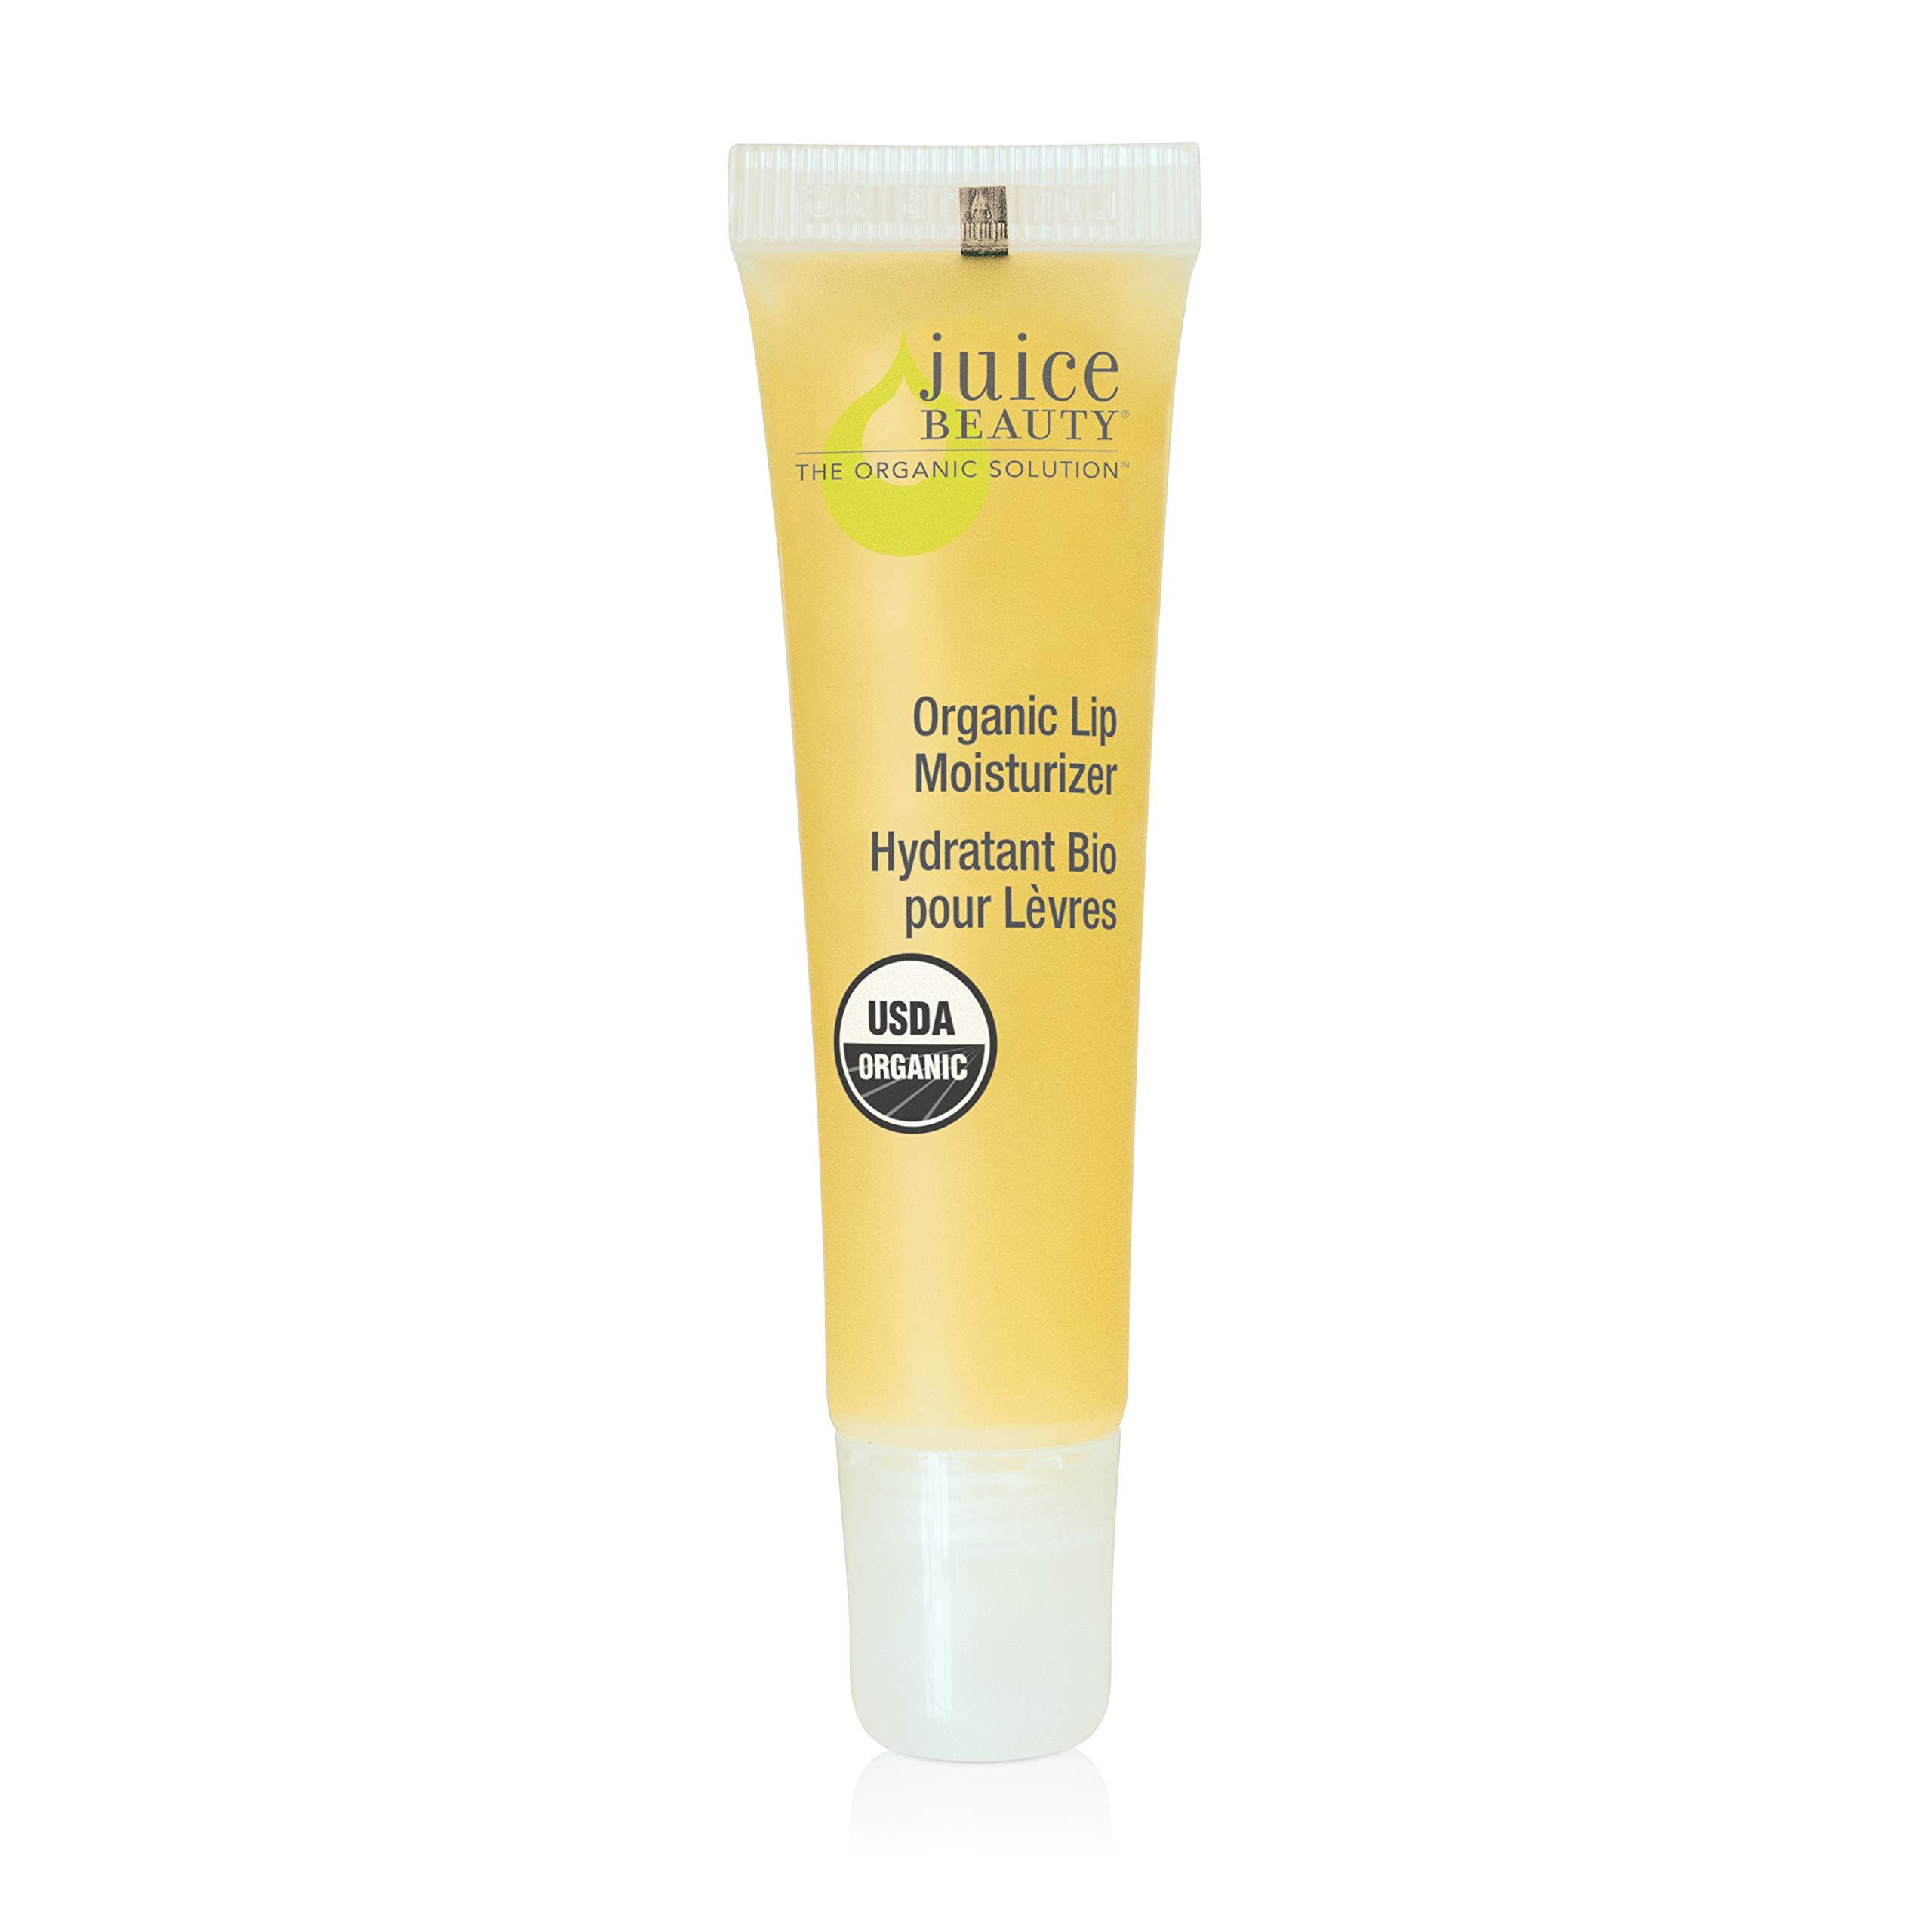 Juice Beauty USDA Organic Lip Moisturizer and Mask, 0.5 Fl Oz